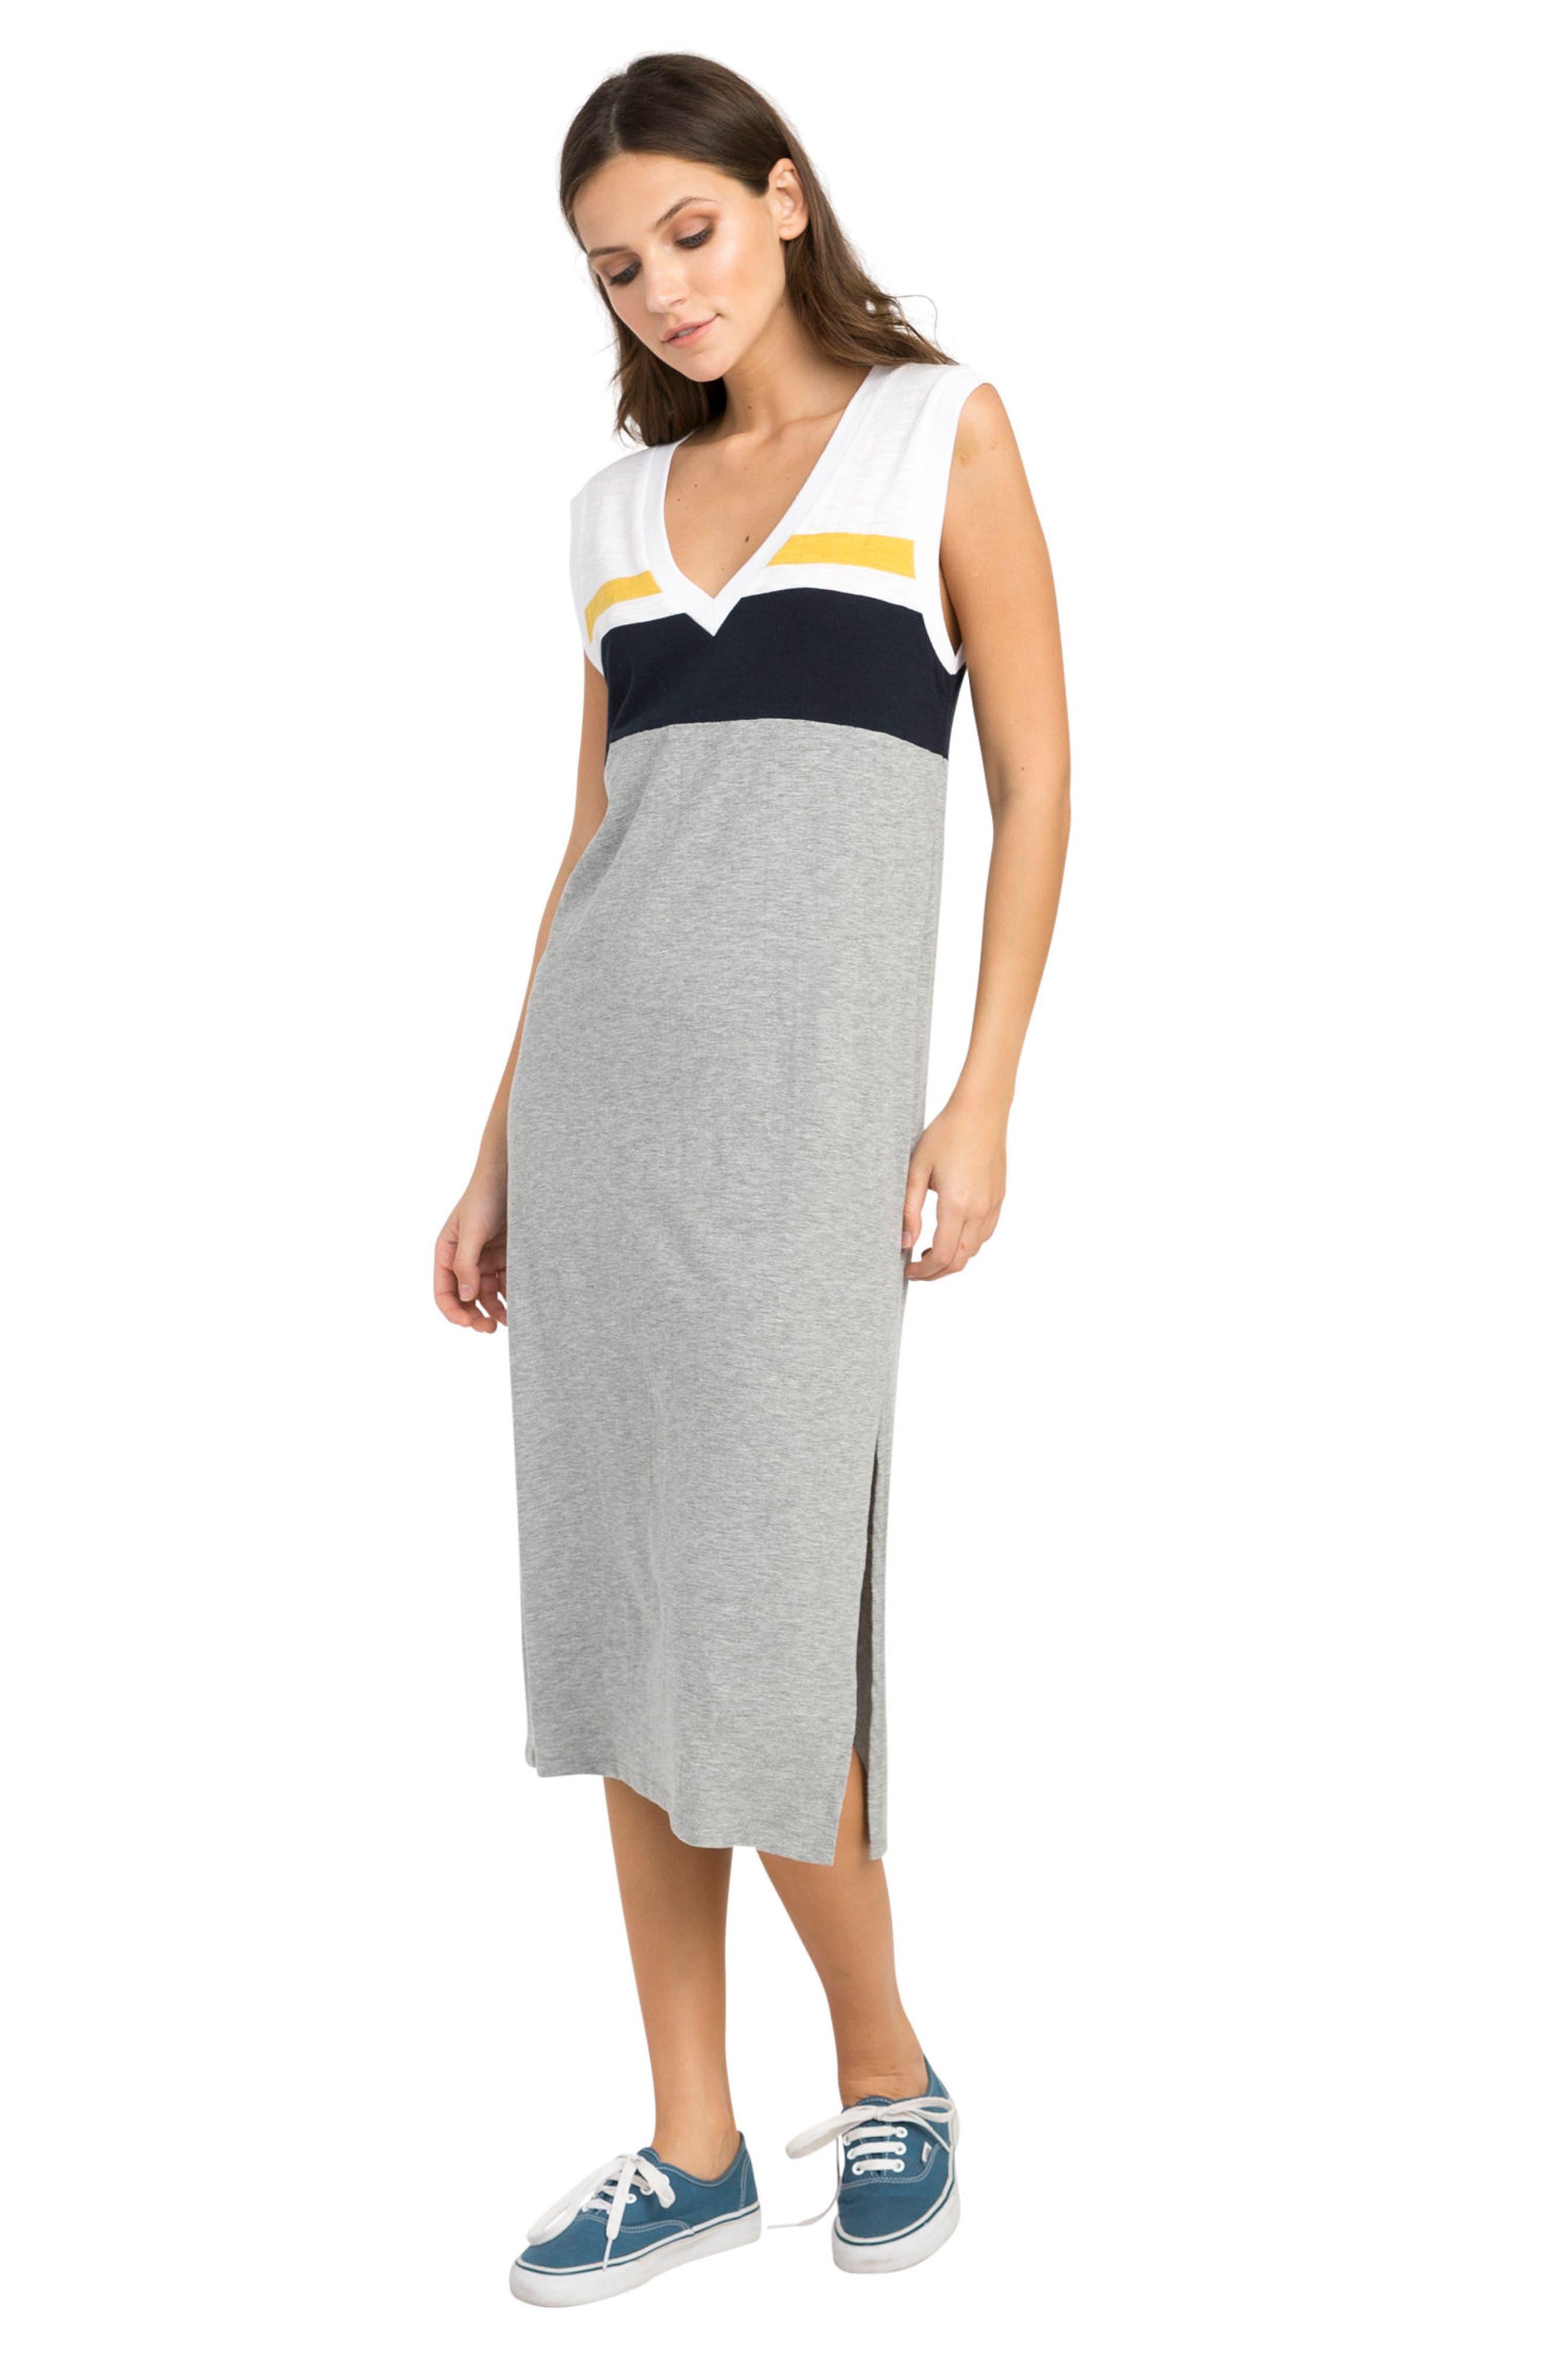 Scorekeeper Midi Dress,                             Alternate thumbnail 4, color,                             054